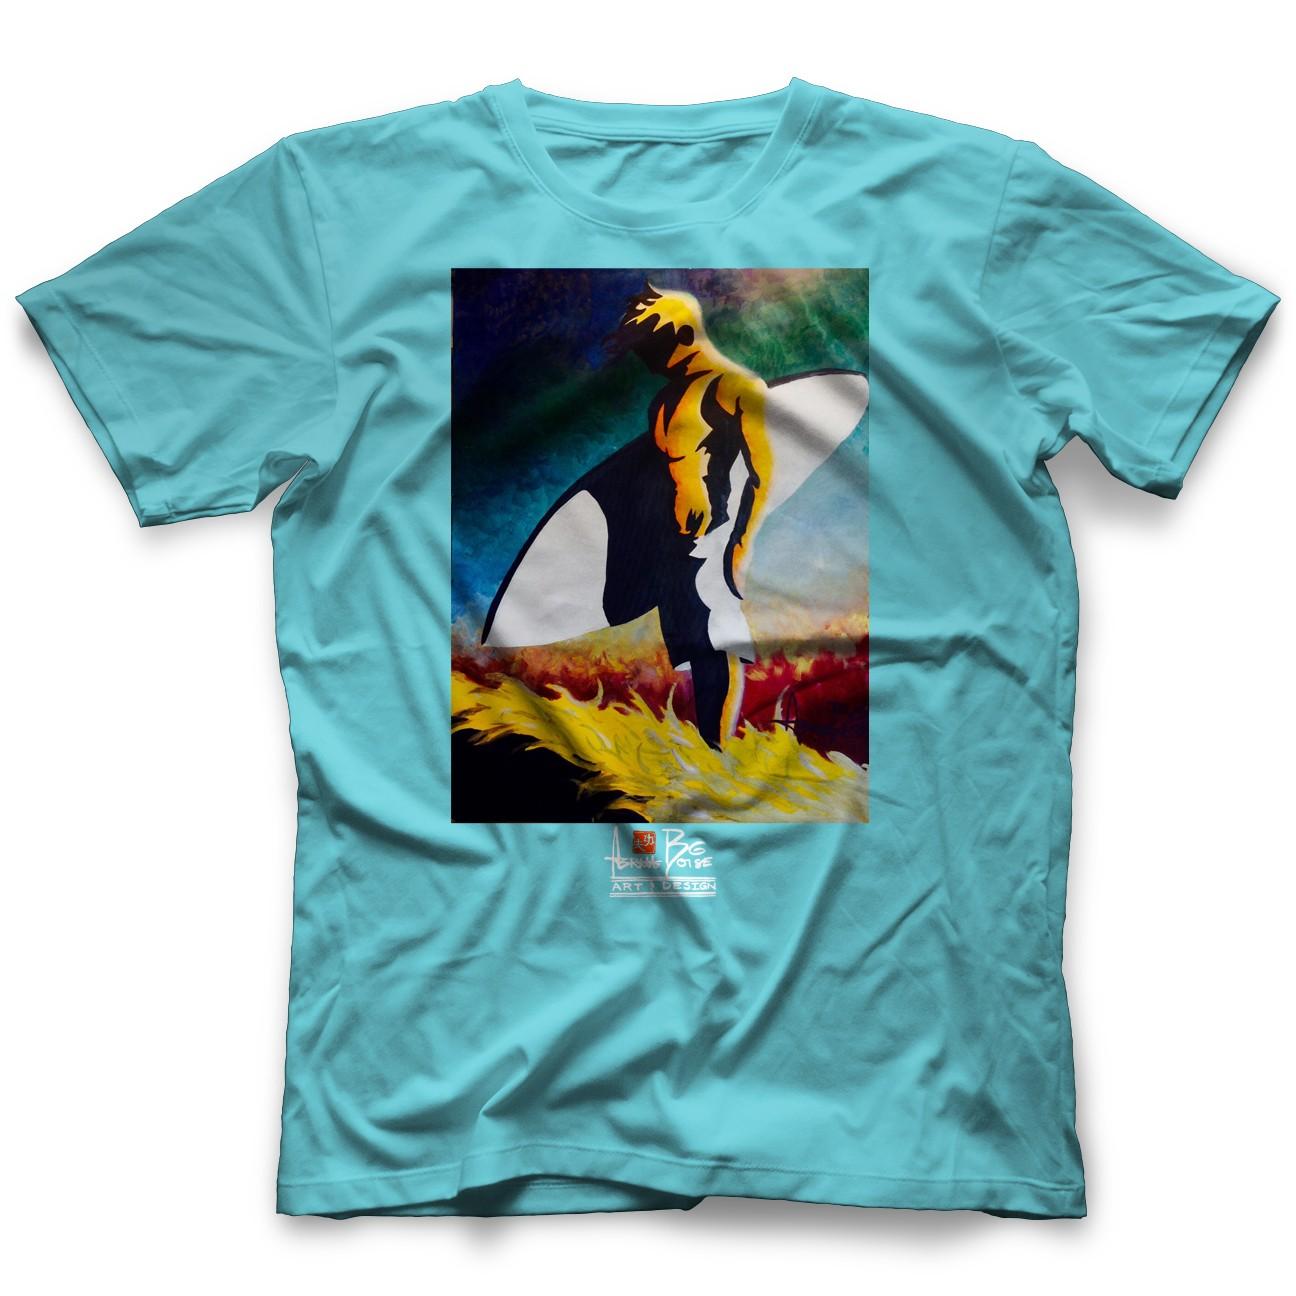 Abram boise the ranch t shirt for Boise t shirt printing